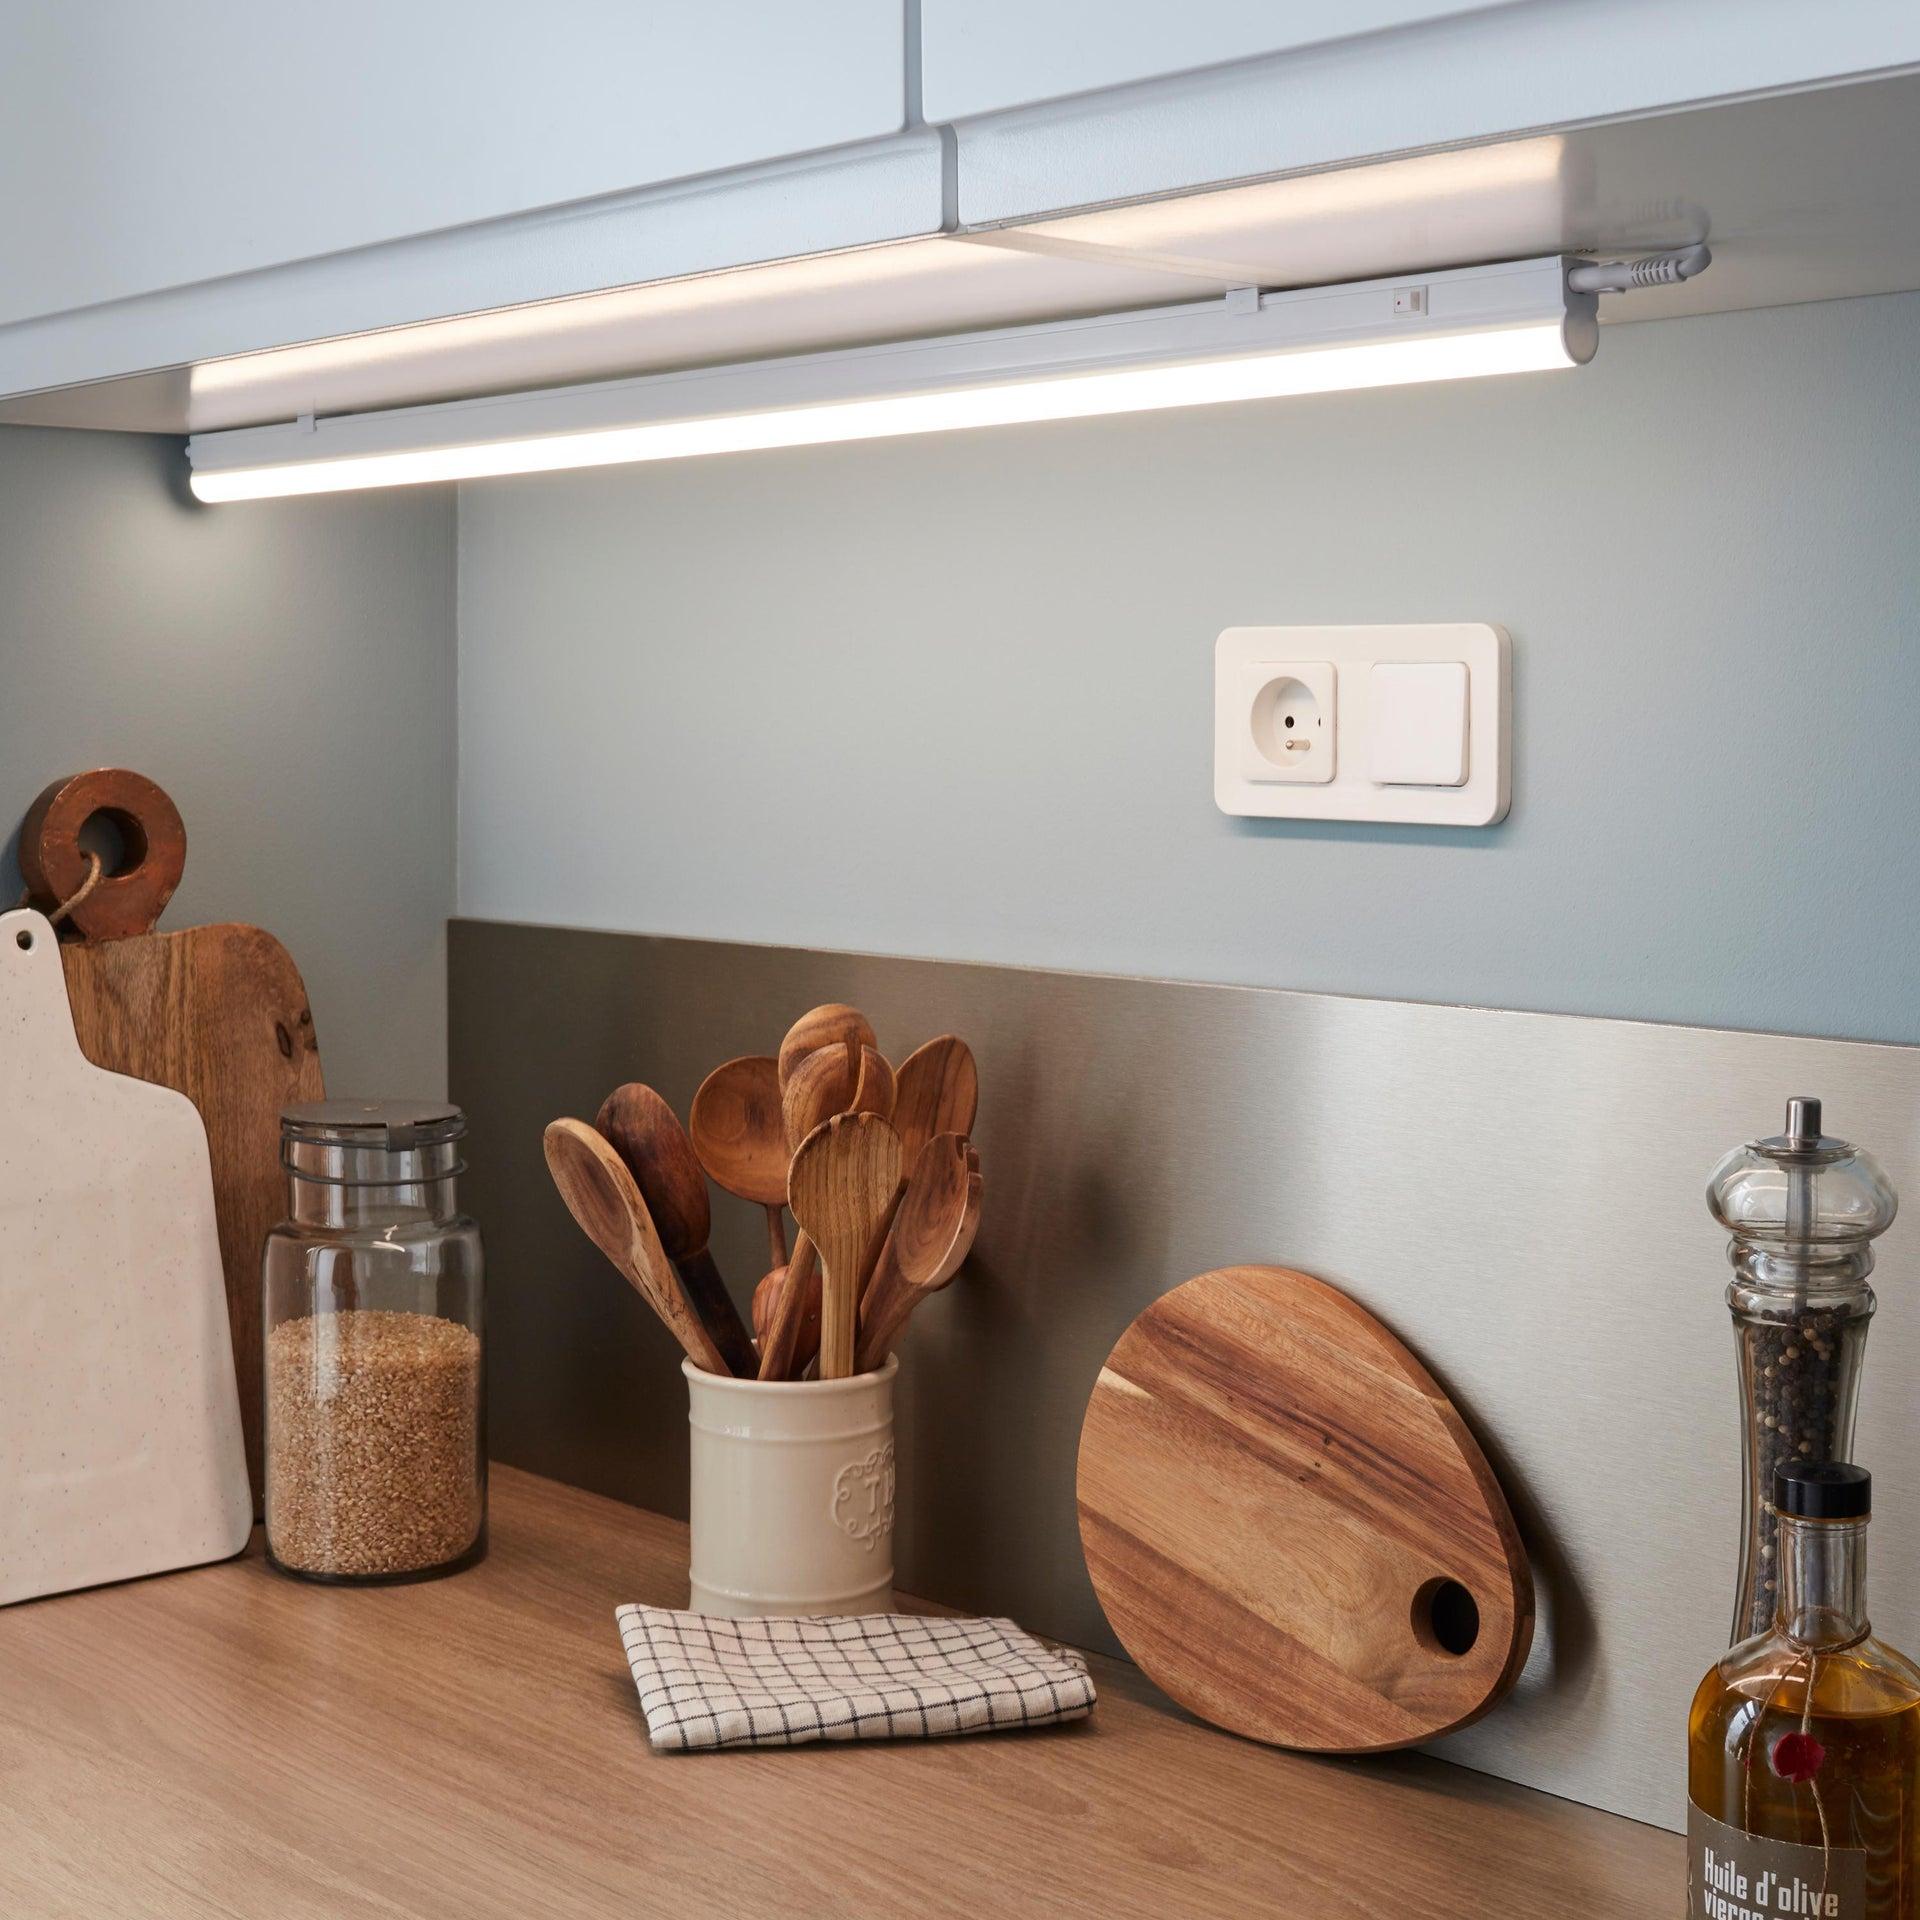 Reglette Moss LED integrato 90.9 cm 11W 1250LM IP20 Inspire - 5